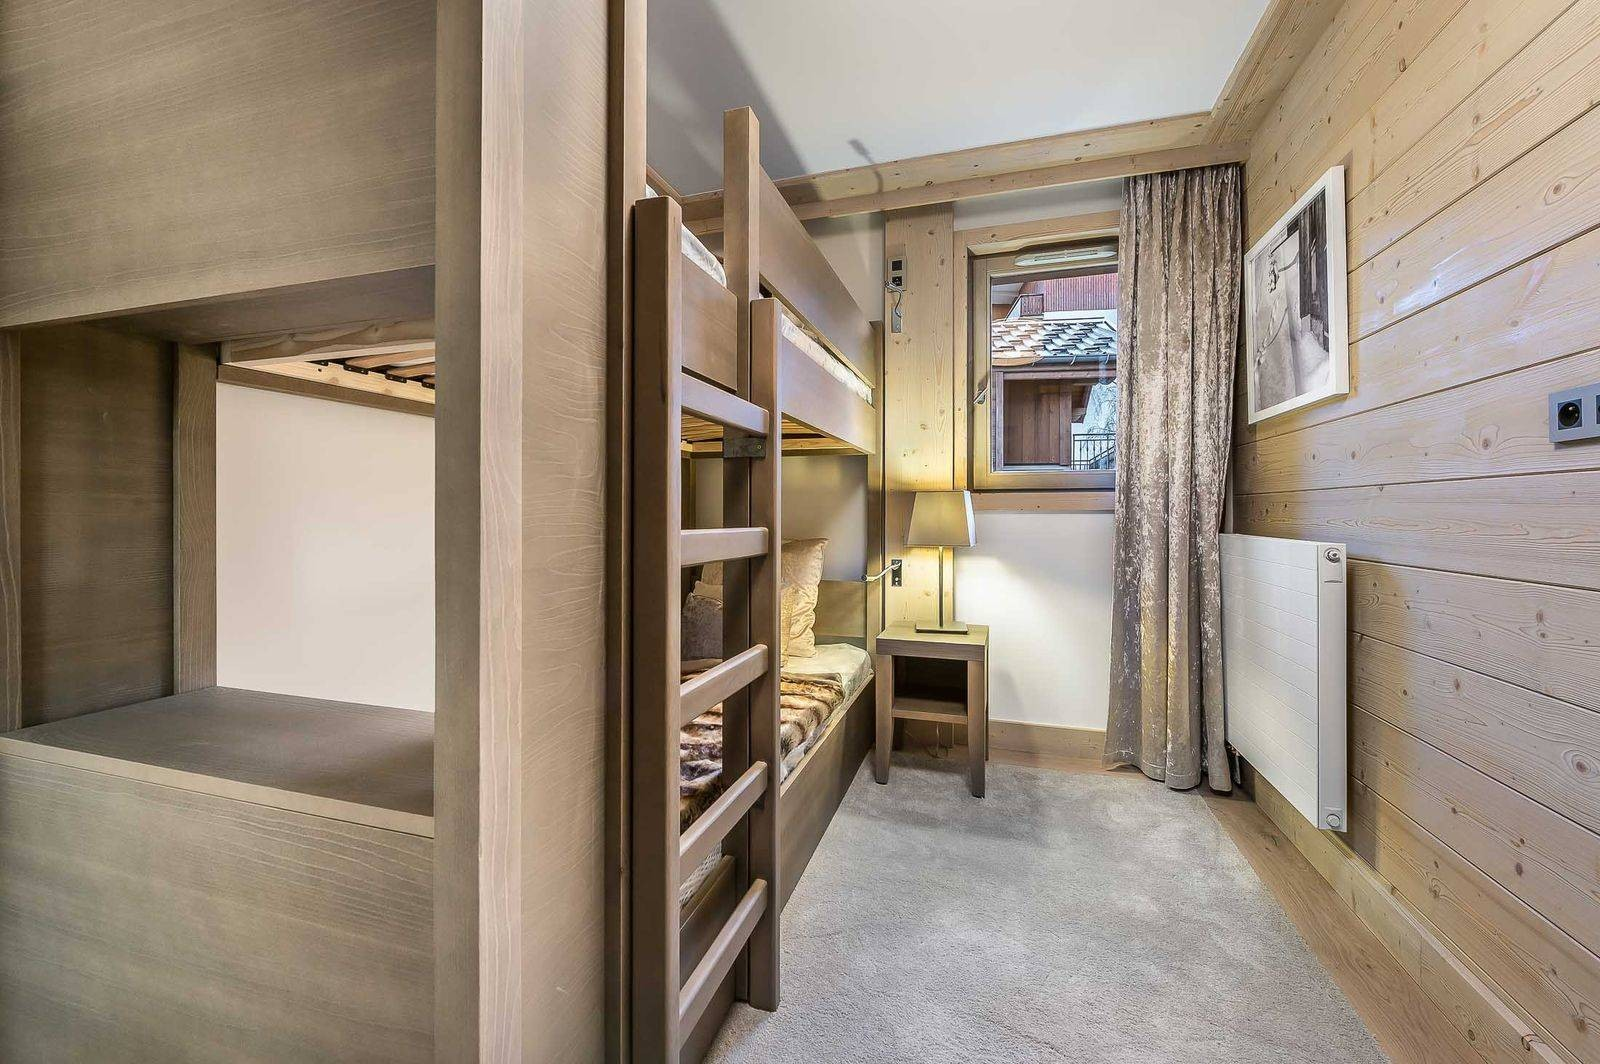 Courchevel 1550 Location Appartement Luxe Telumite Chambre 4